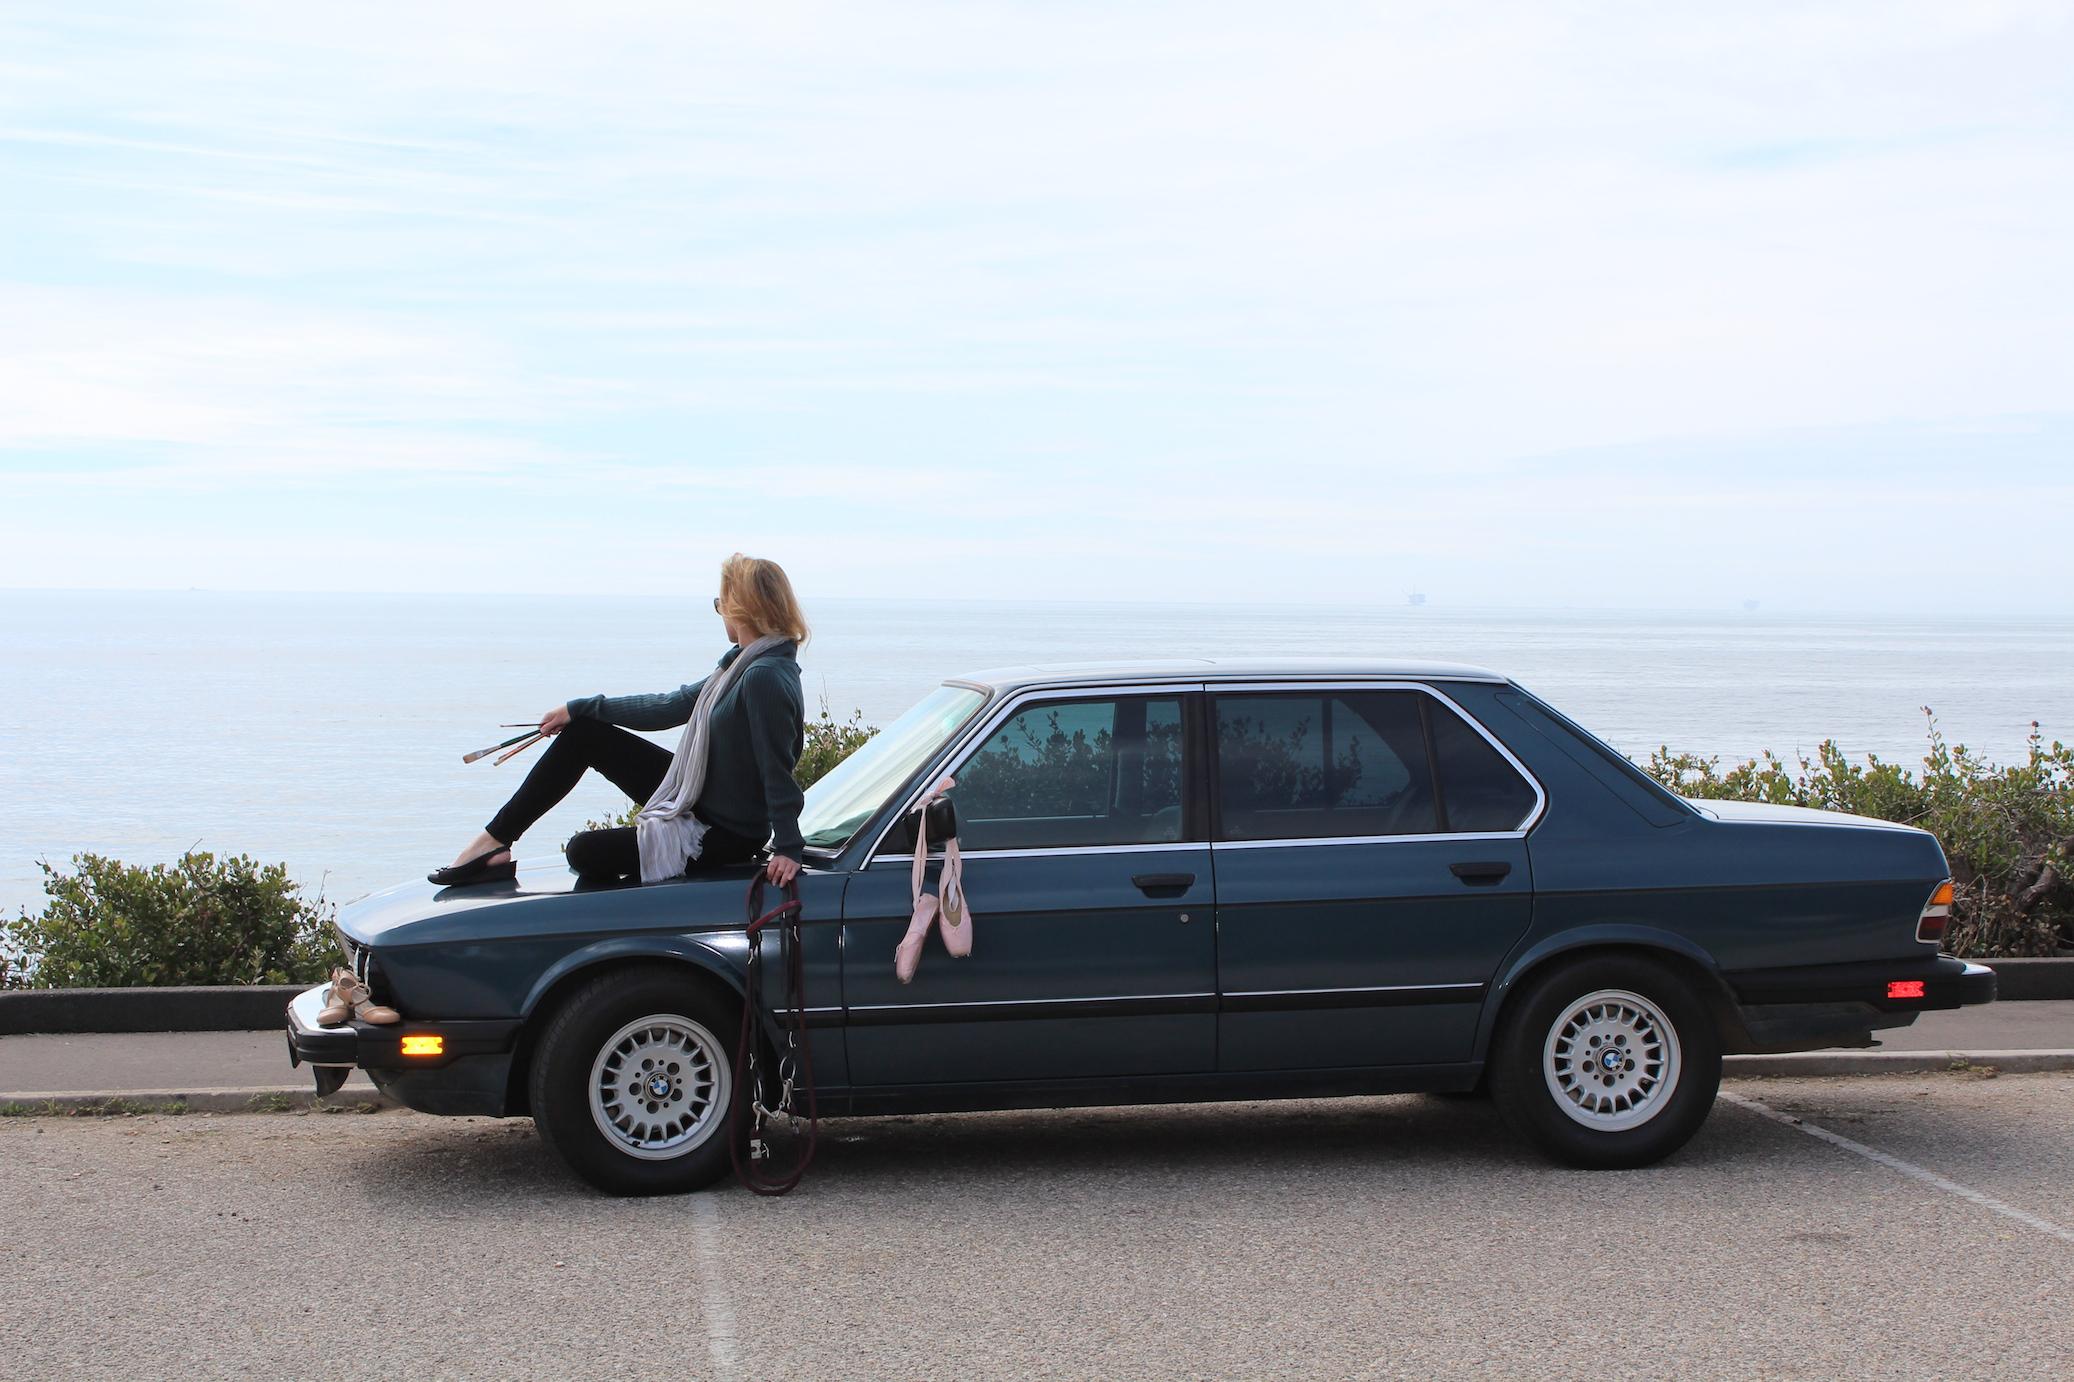 Images Of 1986 Jaguar Xj6 Lowered Calto Wiring Diagram Bmw 528e Engine Free Download Diagrams